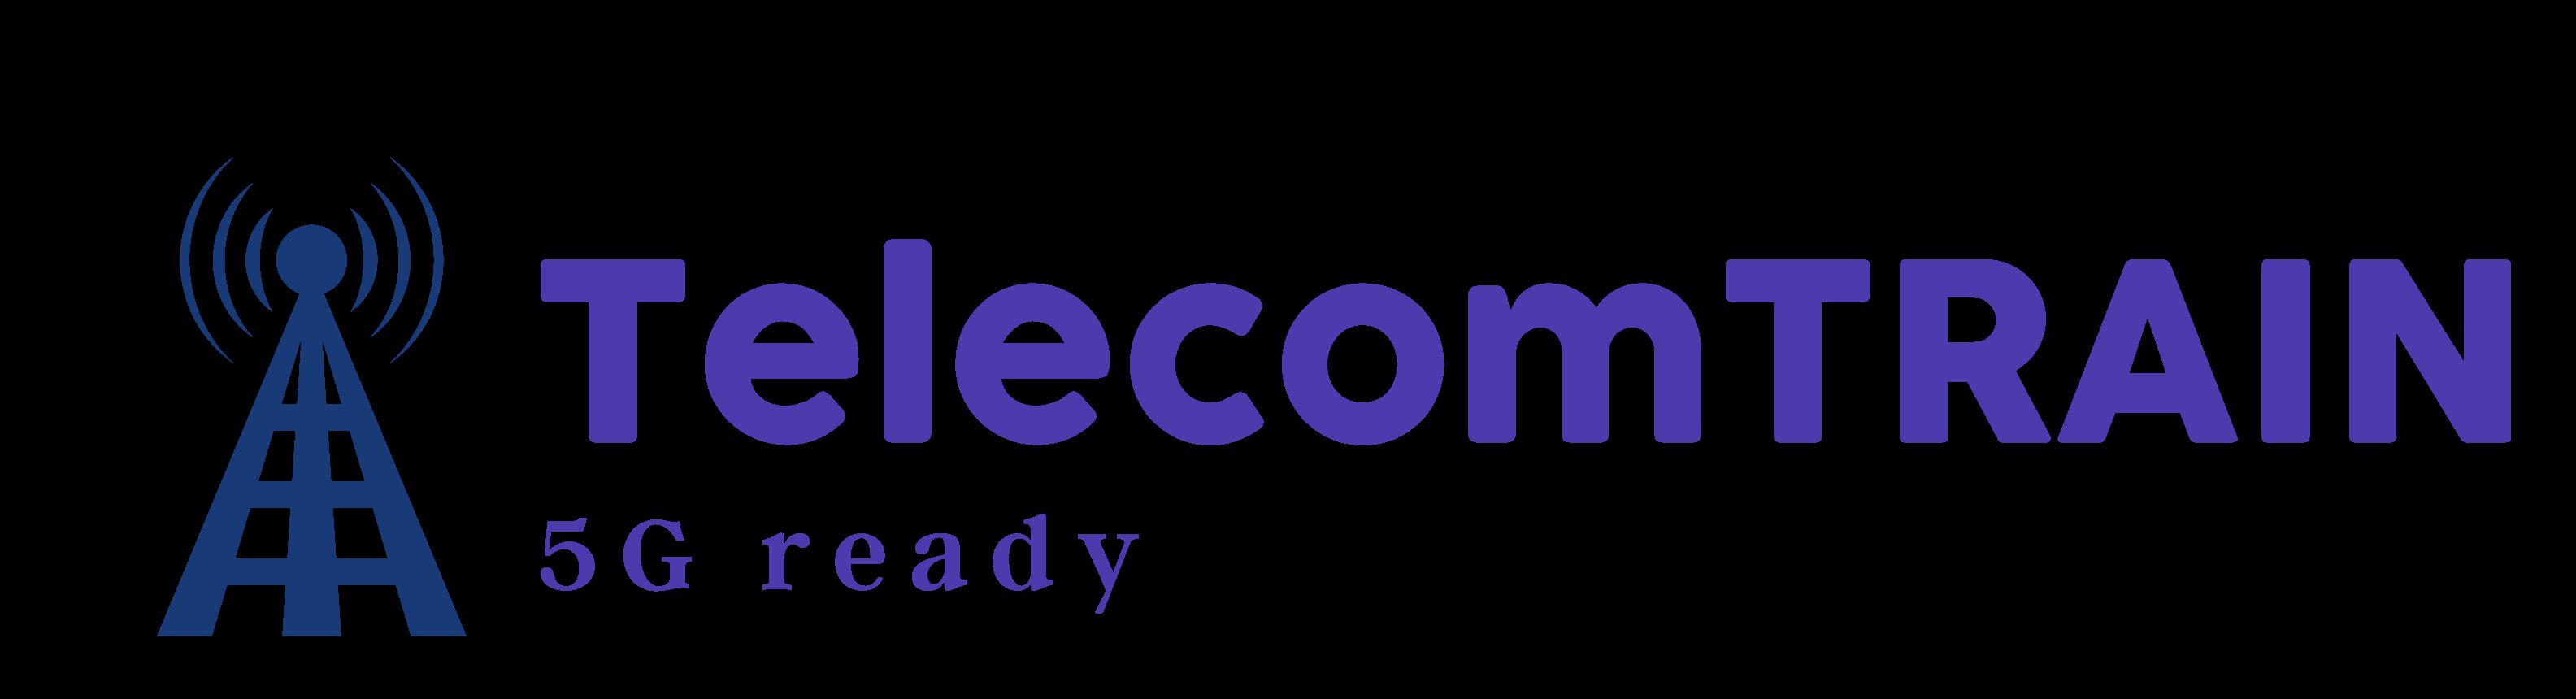 TelecomTRAIN